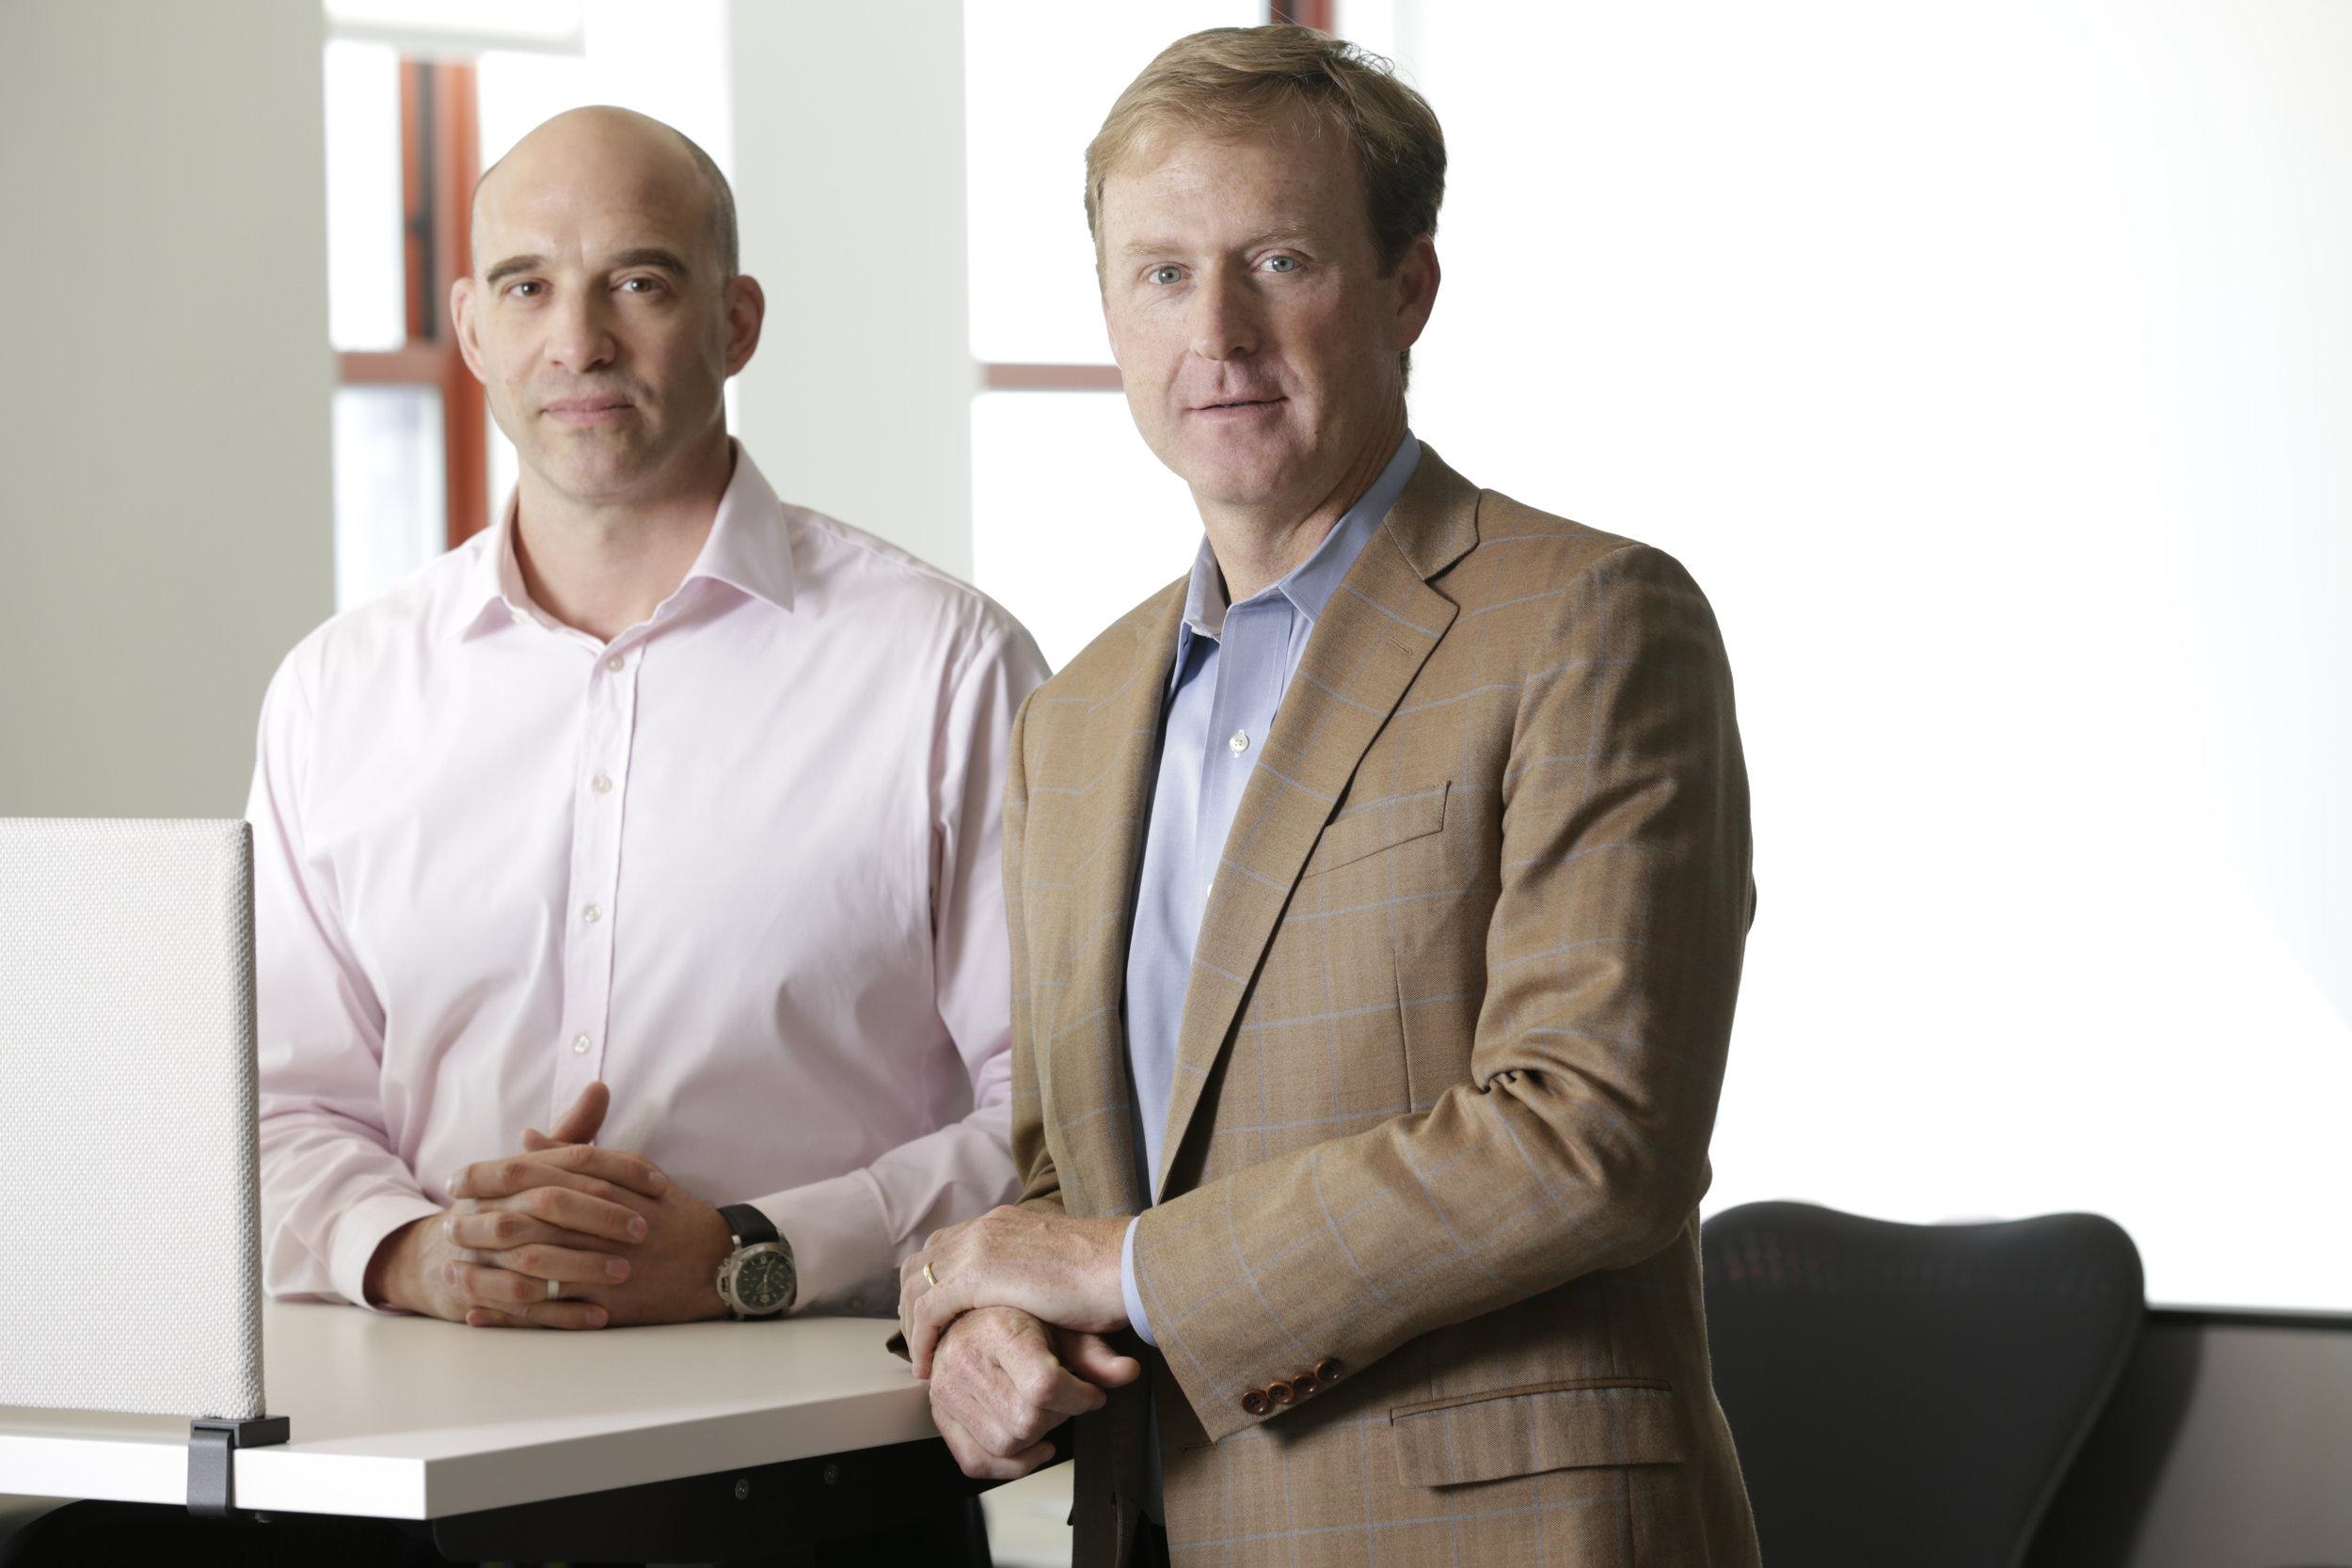 LinkedIn VP Corporate Headshots by Michael Benabib executivephotosnyc.jpg